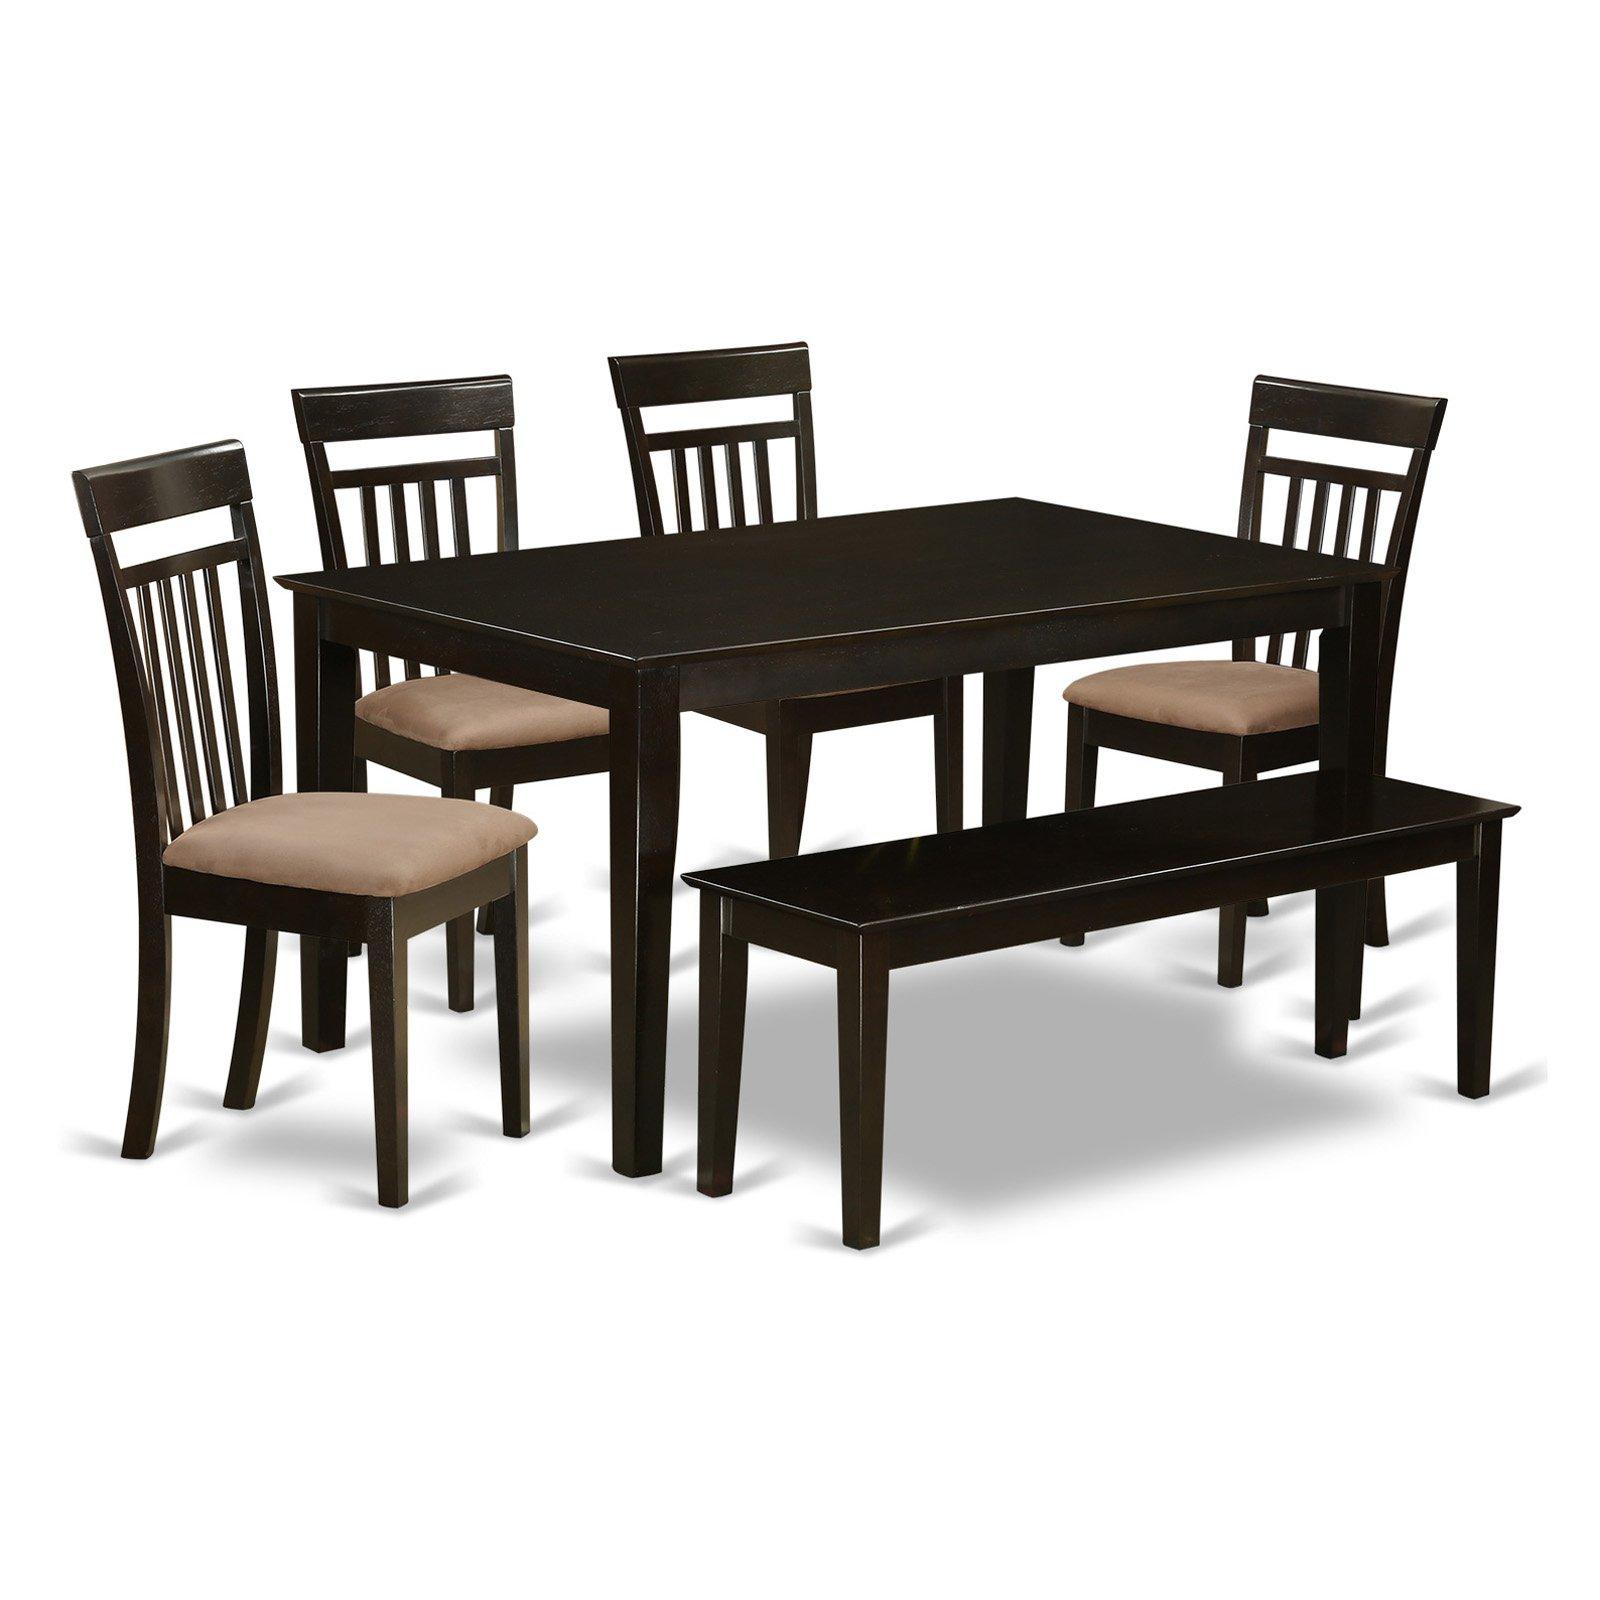 East West Furniture Capri 6 Piece Sheraton Dining Table Set